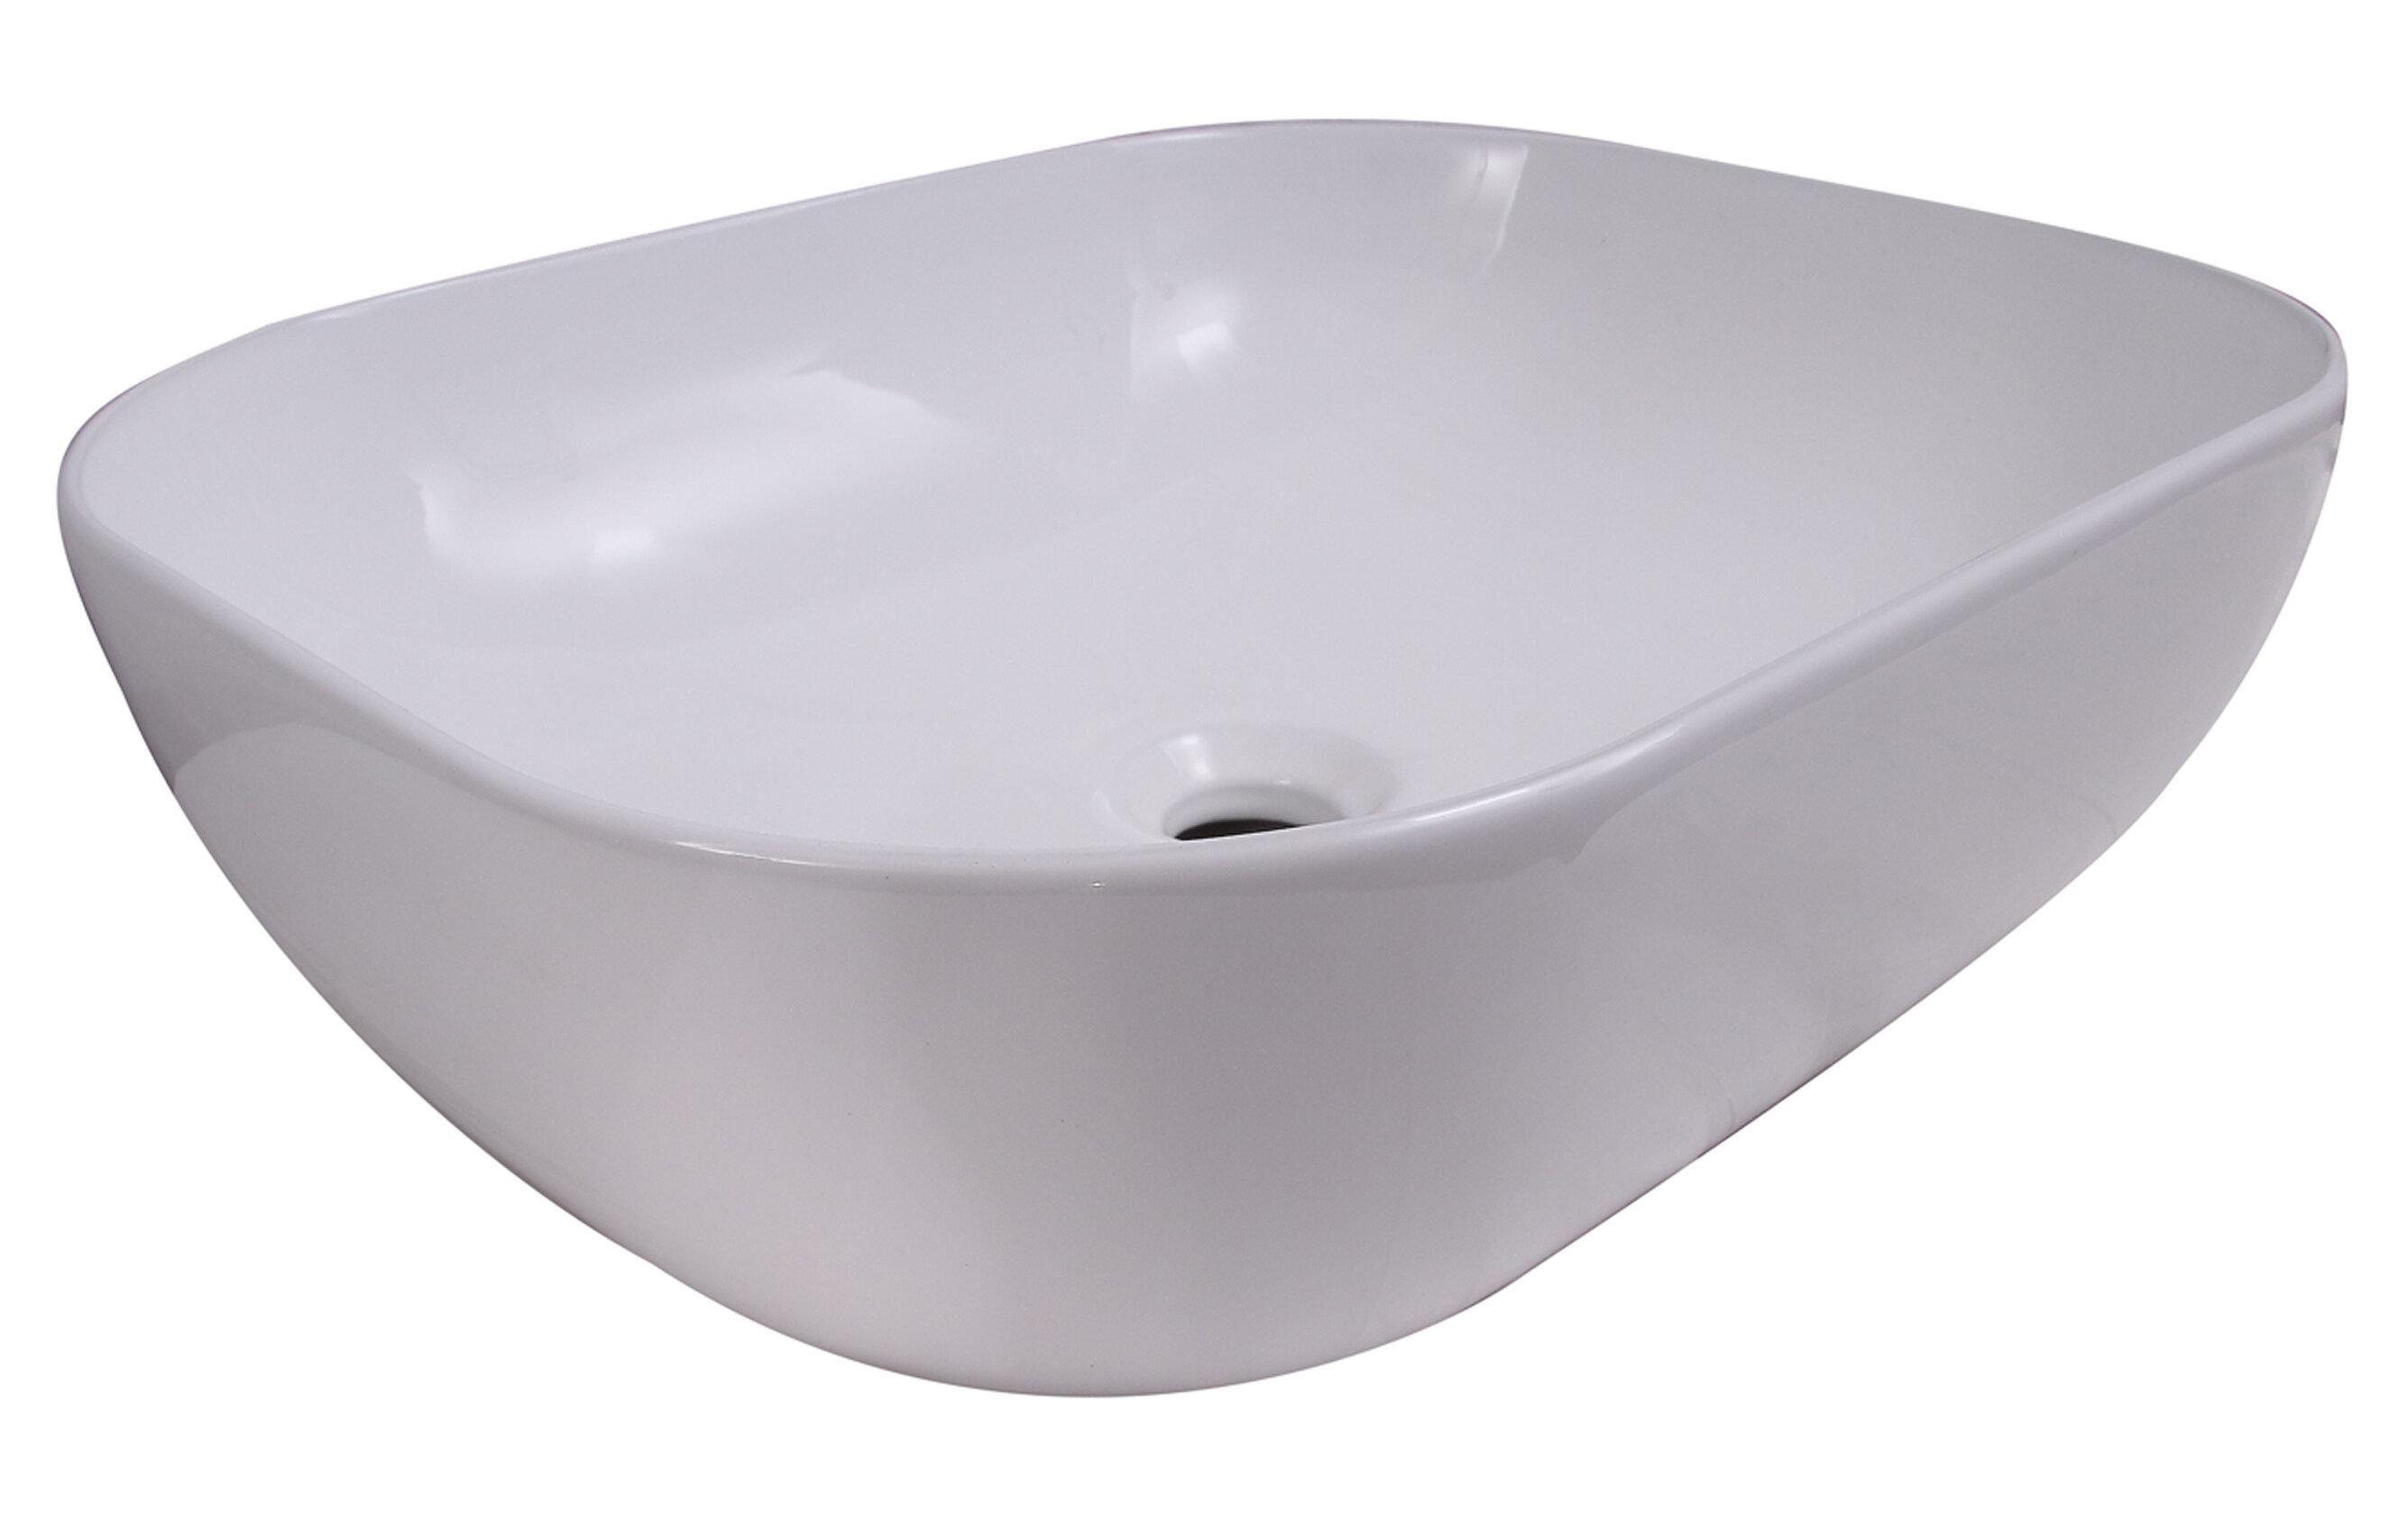 Barclay Kendra Vitreous China Oval Vessel Bathroom Sink Wayfair